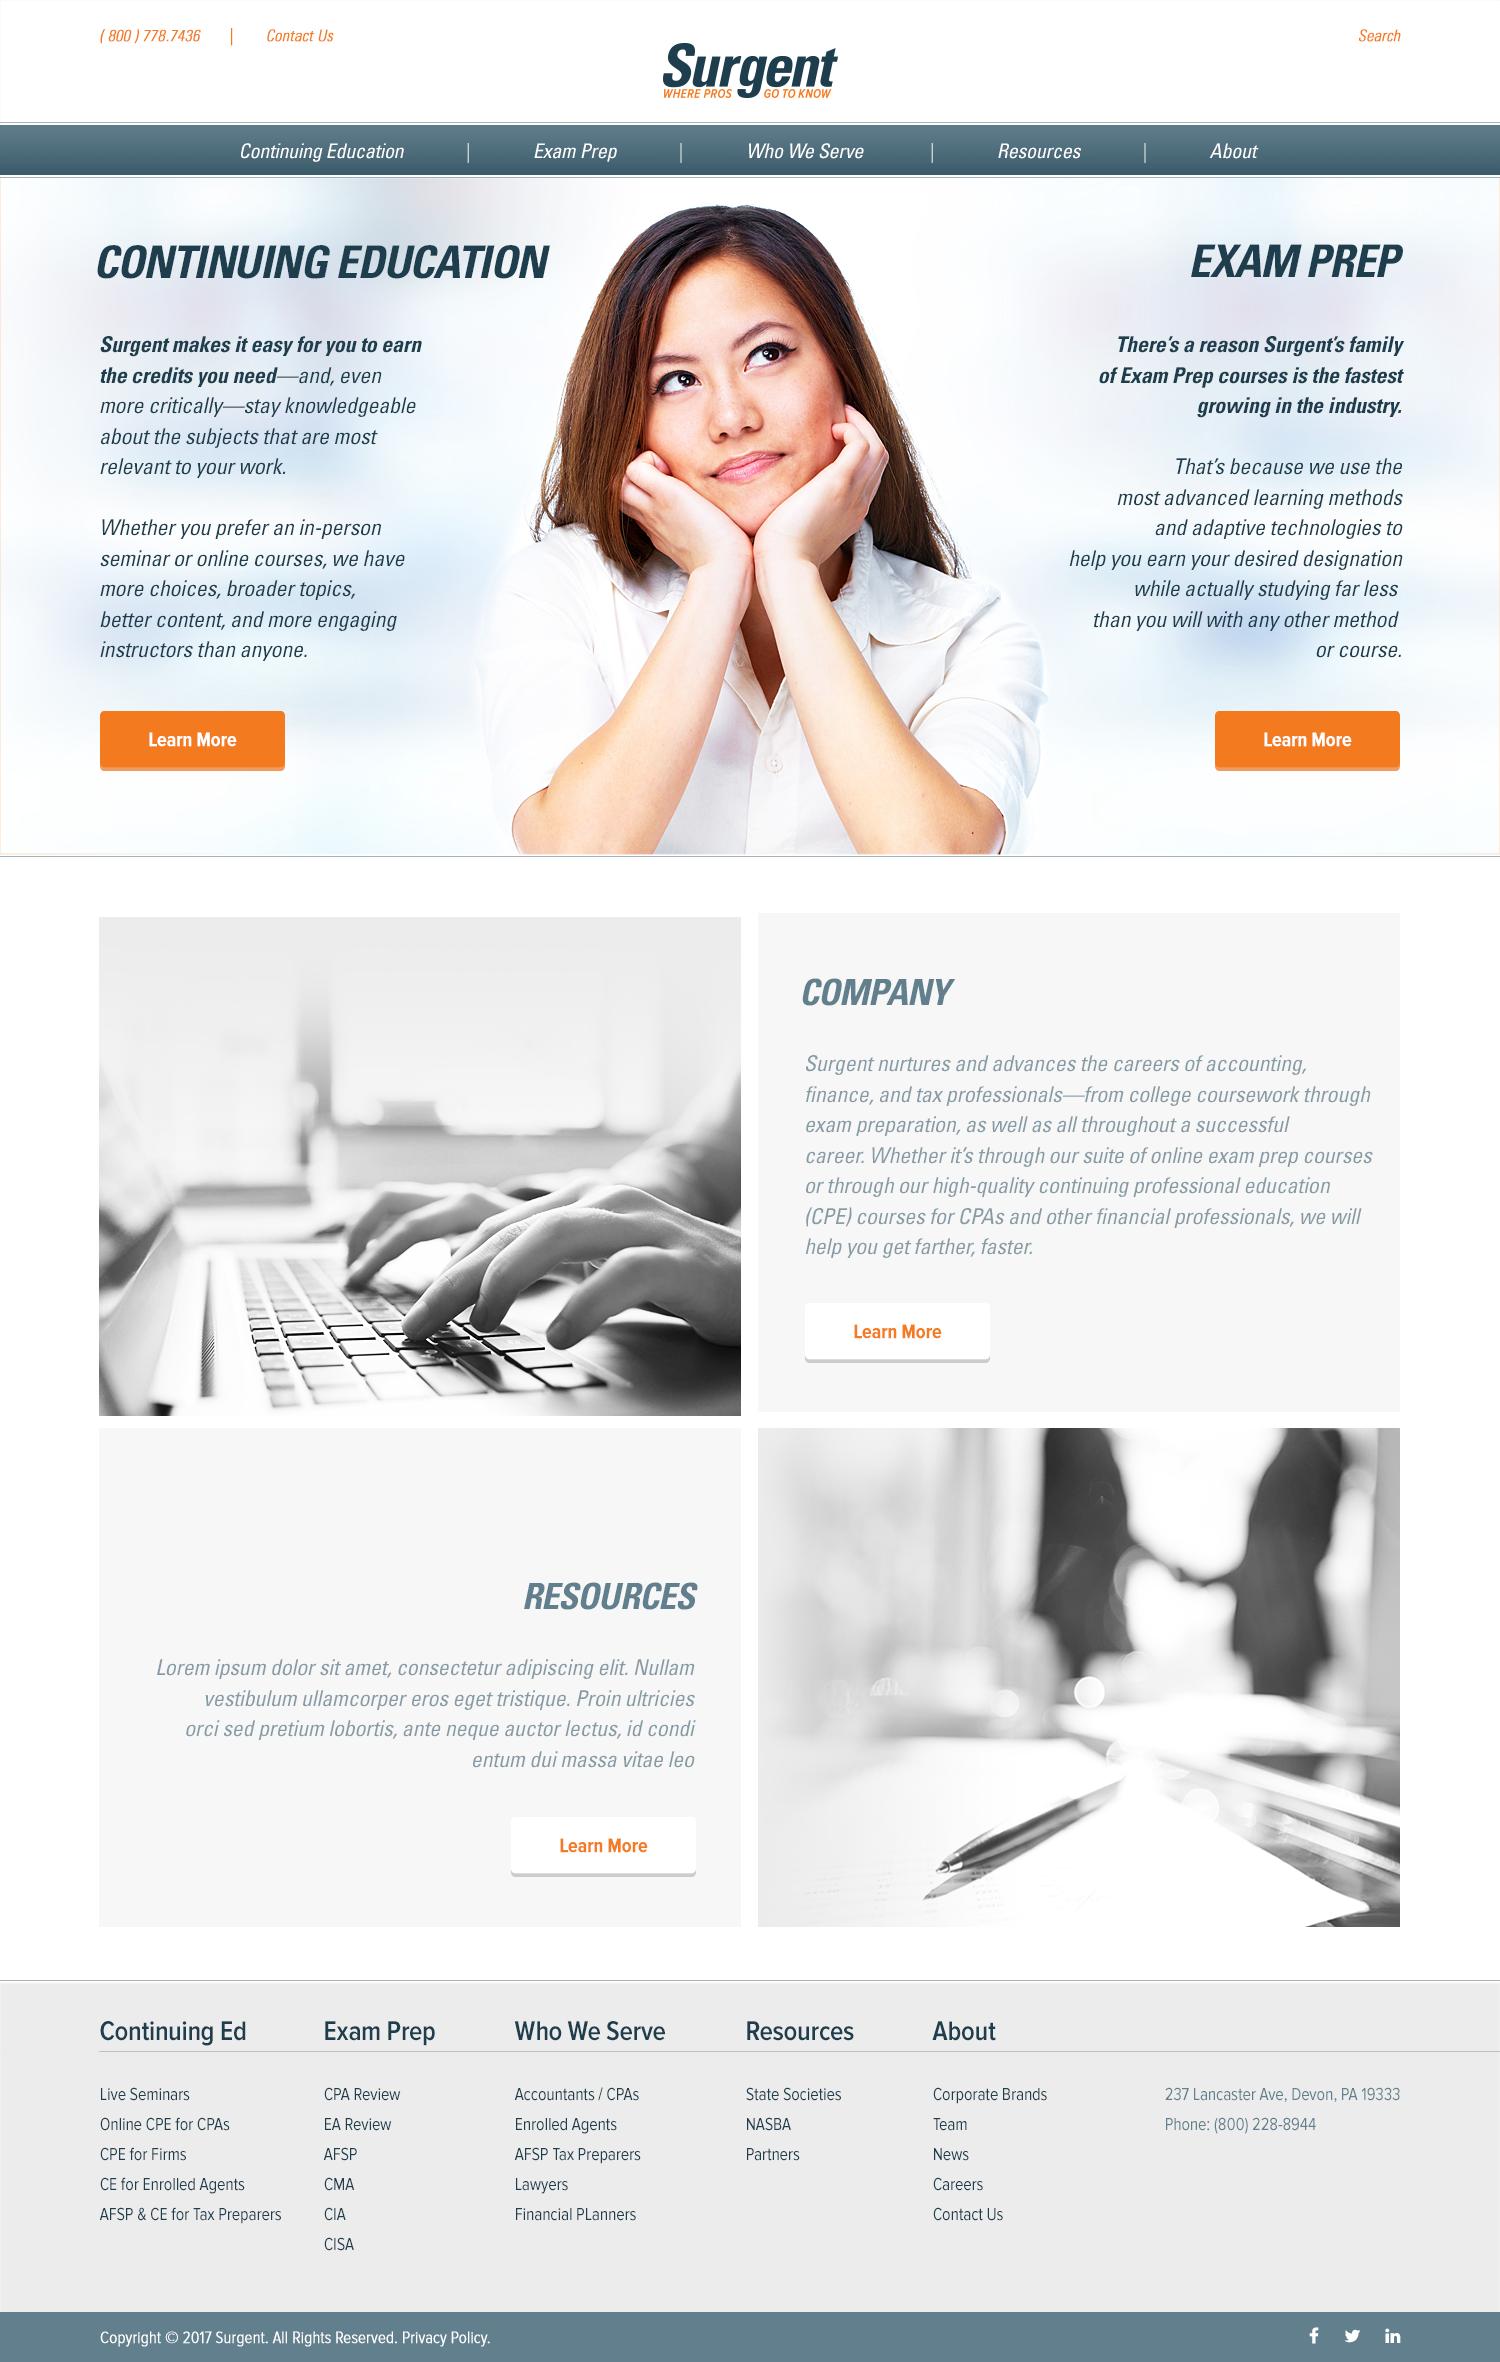 Surgent.com's redesigned homepage.